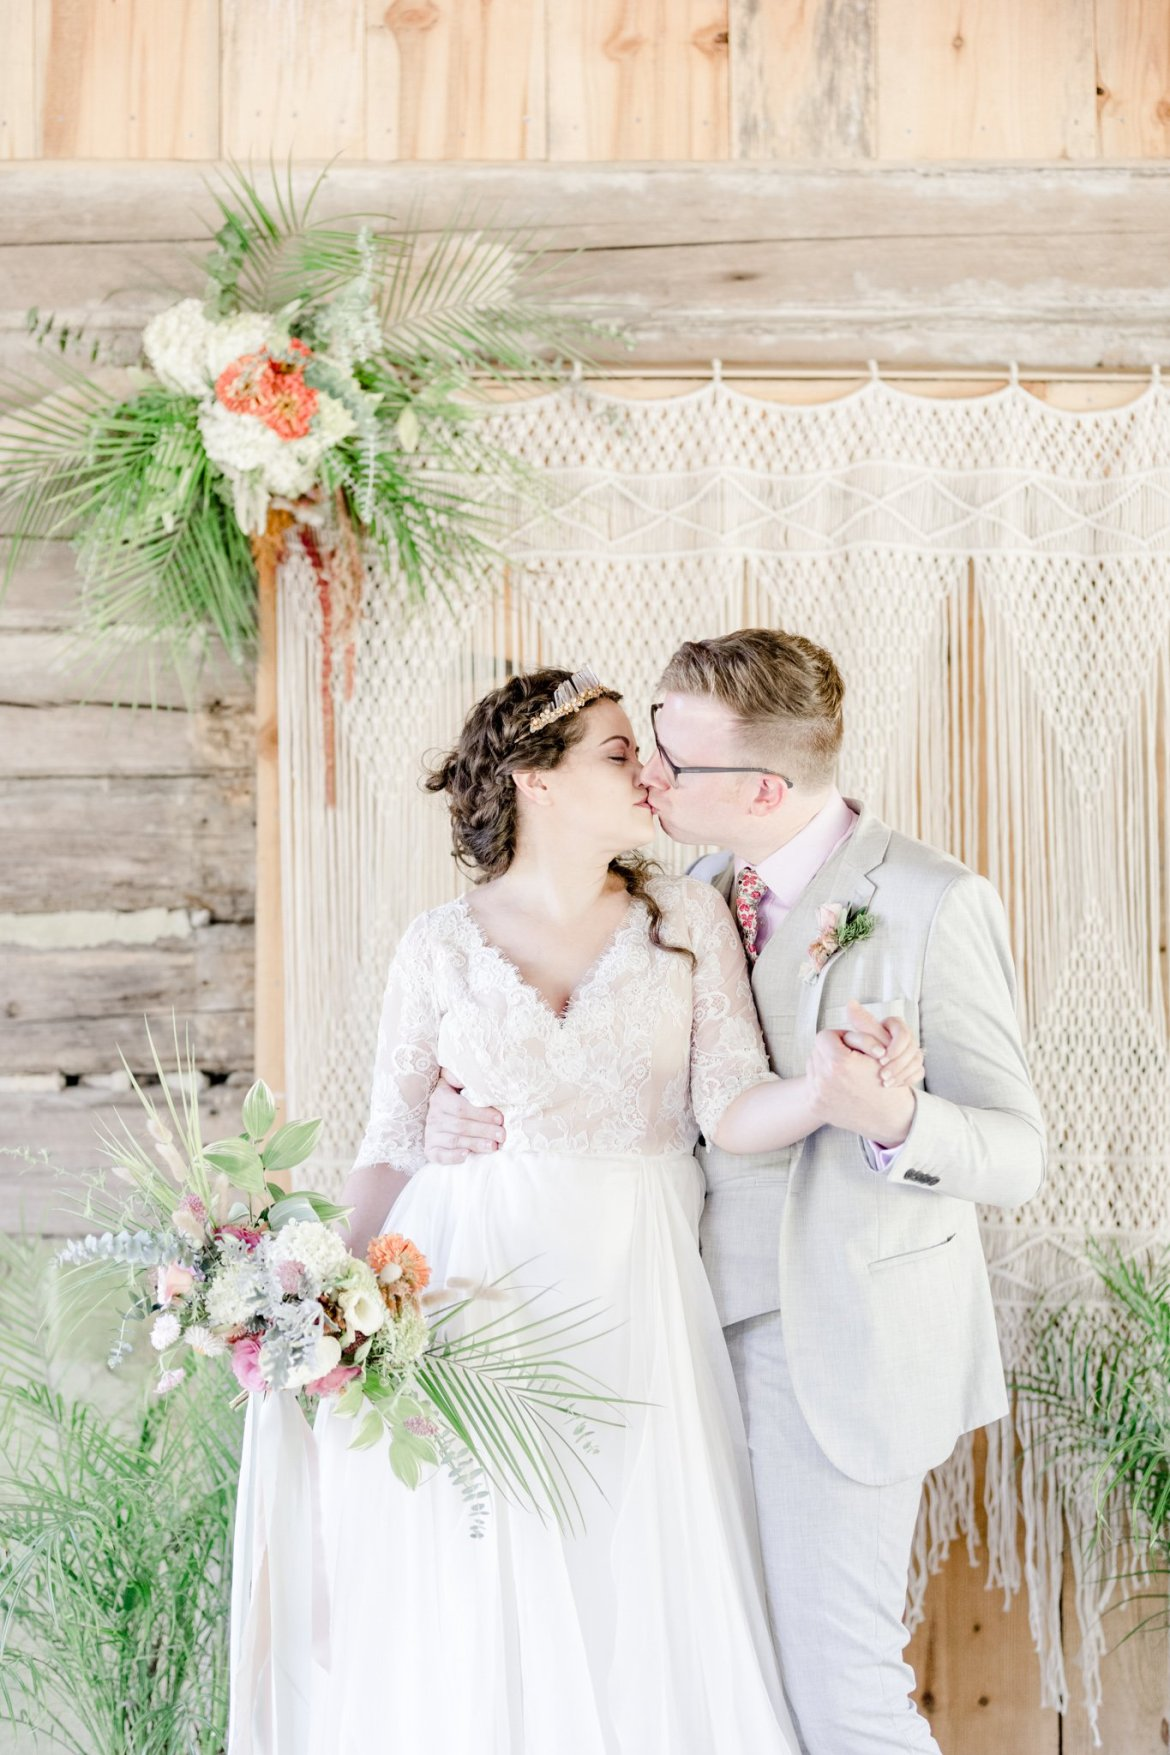 eec393de2119e1 wedding vendors Archives - Bridechilla Wedding Planning